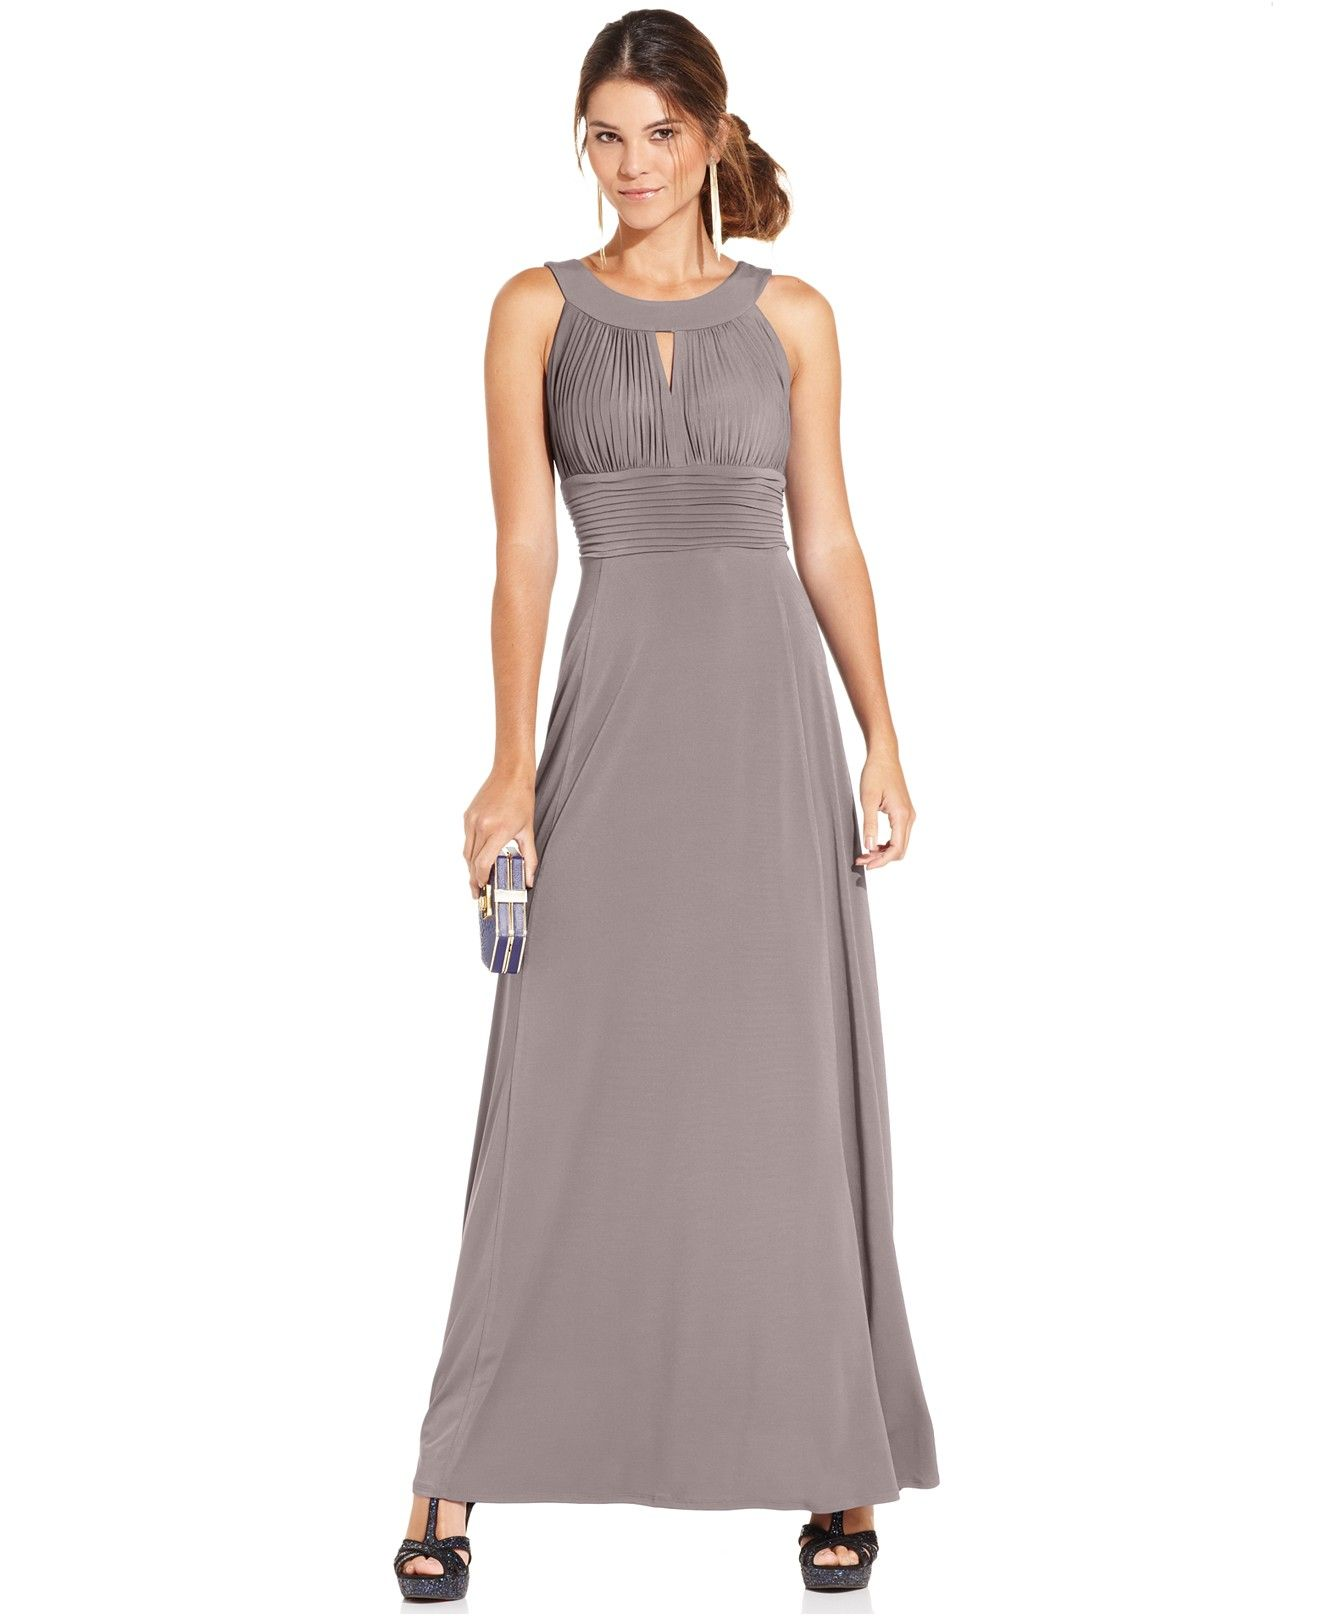 fad0b0871ed Sangria Sleeveless Keyhole Gown - Maxi Dresses - Women - Macy s